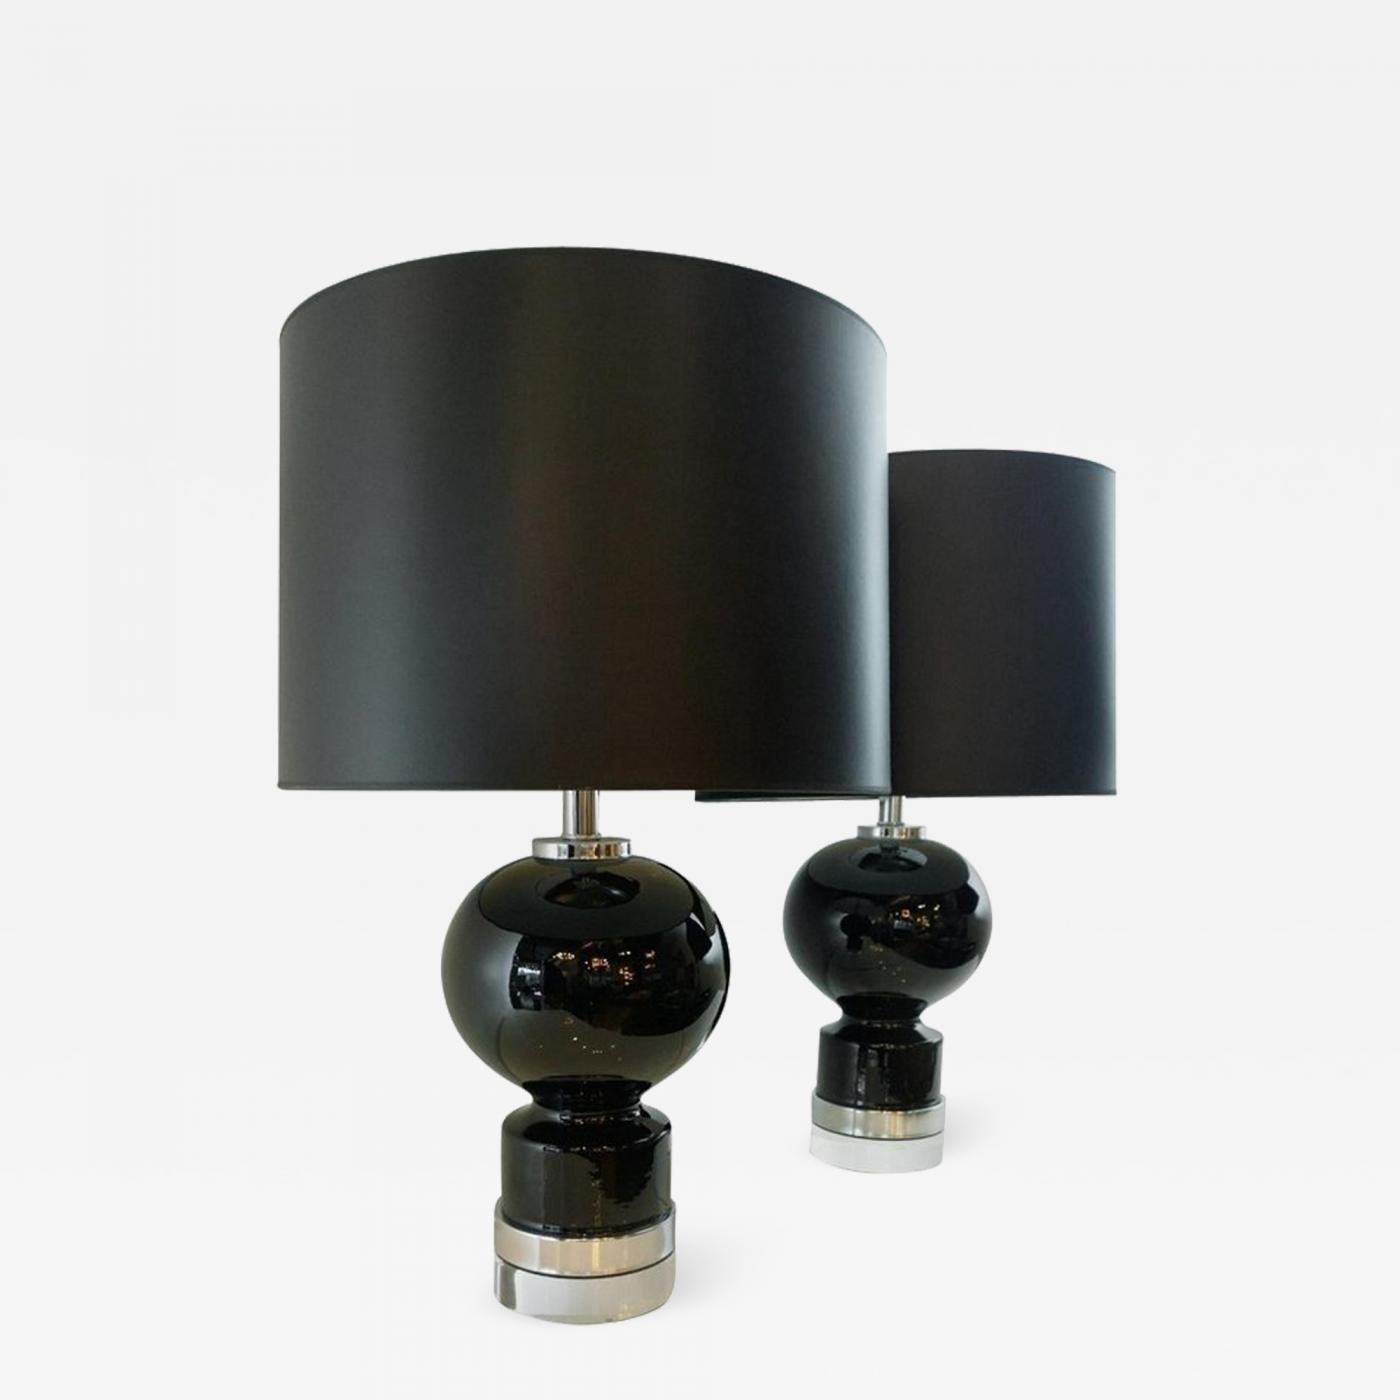 Lightolier Mid Century Modern Pair Of Black Ceramic Table Lamps W Chrome Lucite Bases